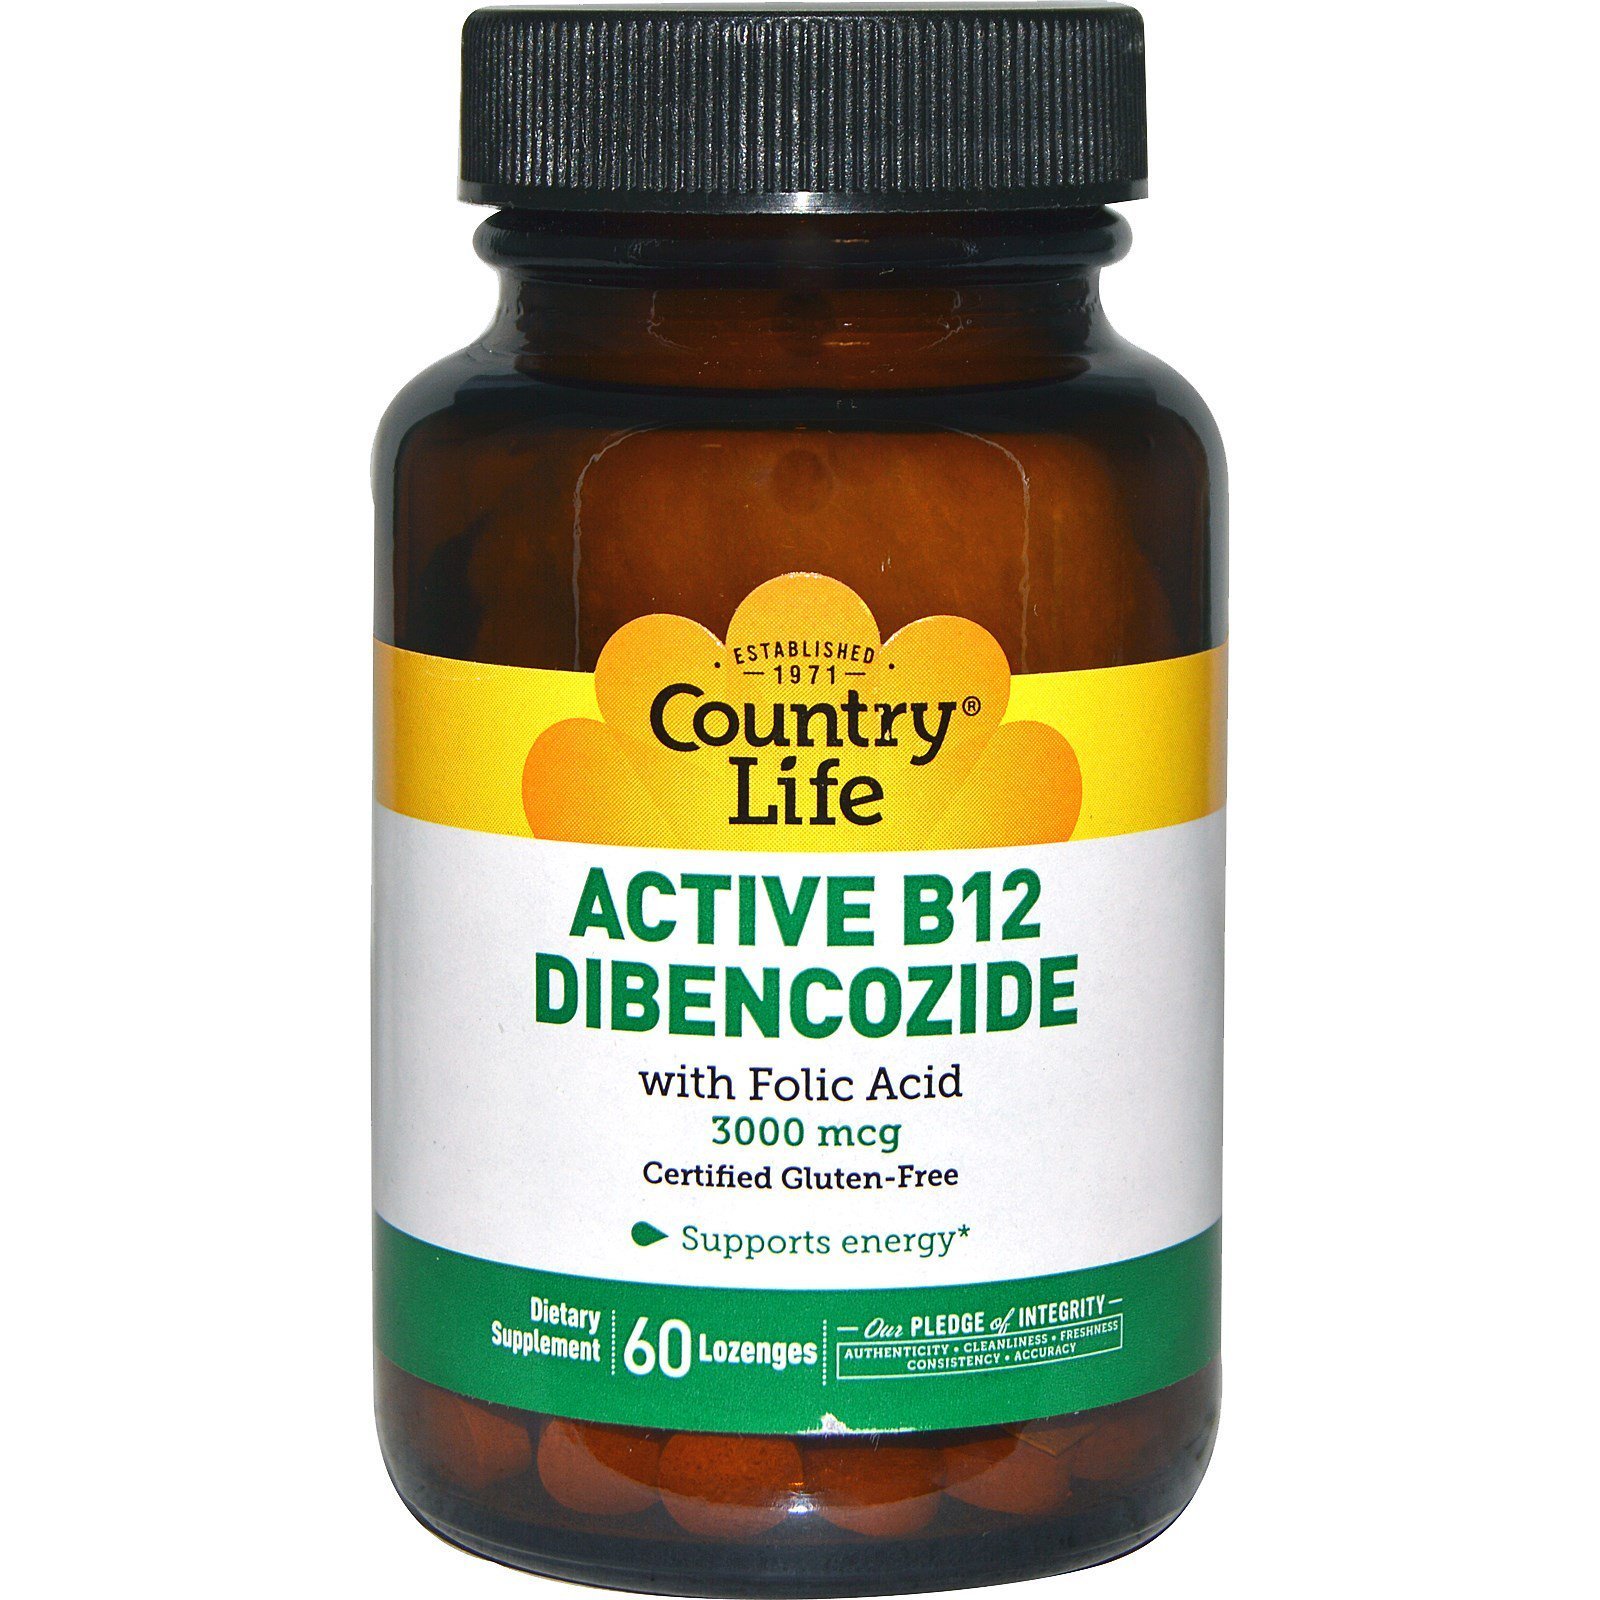 Country Life, Active B12 Dibencozide, 3000 mcg, 60 Lozenges